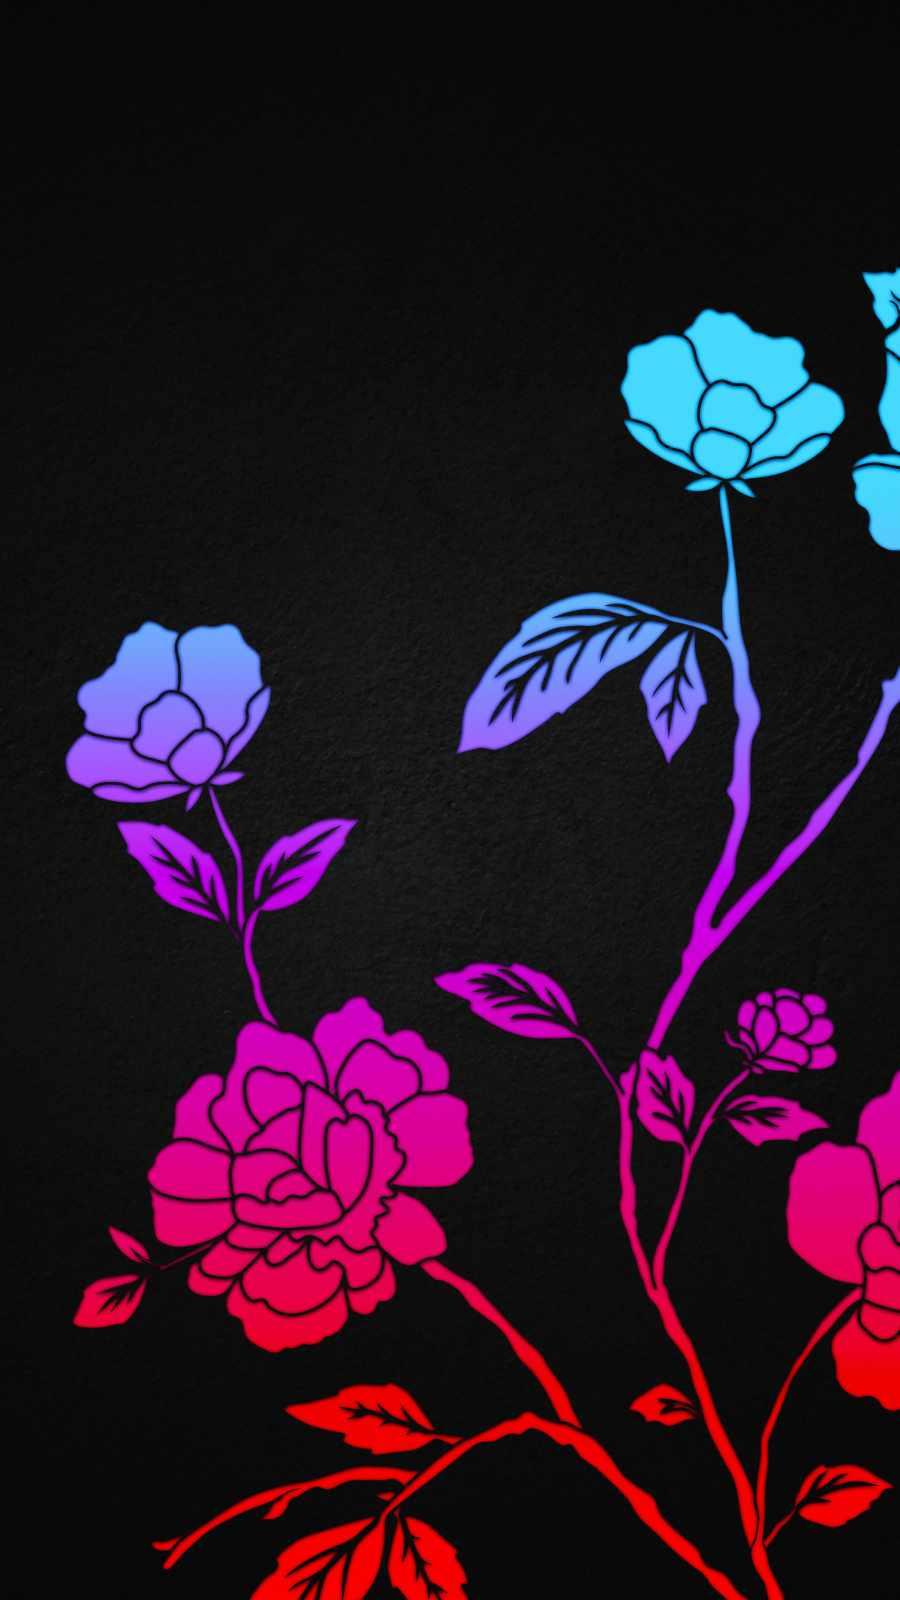 Flower Plant Art iPhone Wallpaper